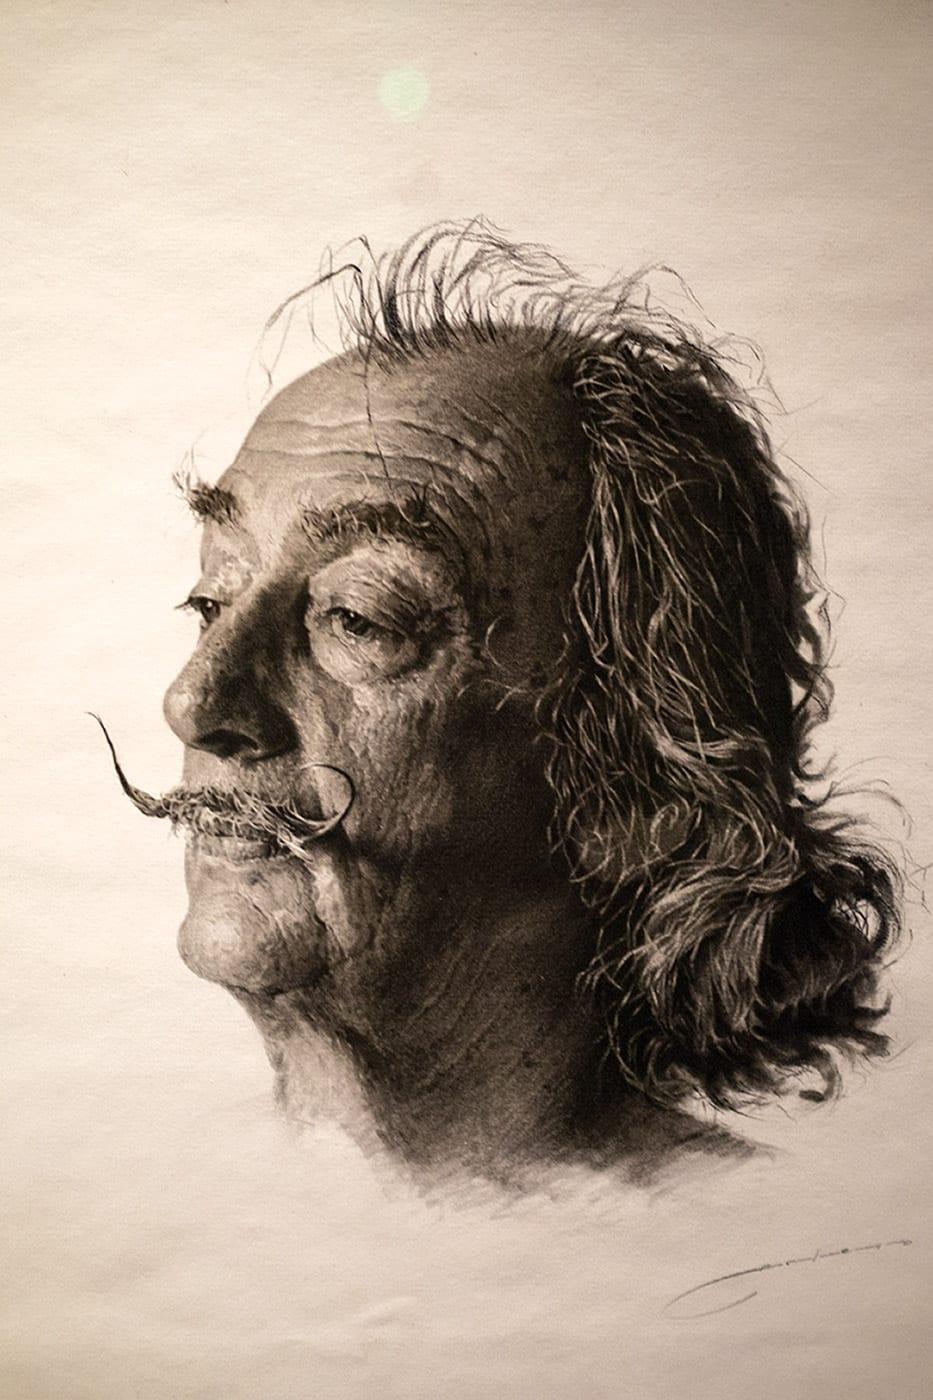 Teatro-Museo Dalí, Figueres, costa brava, surrealismo